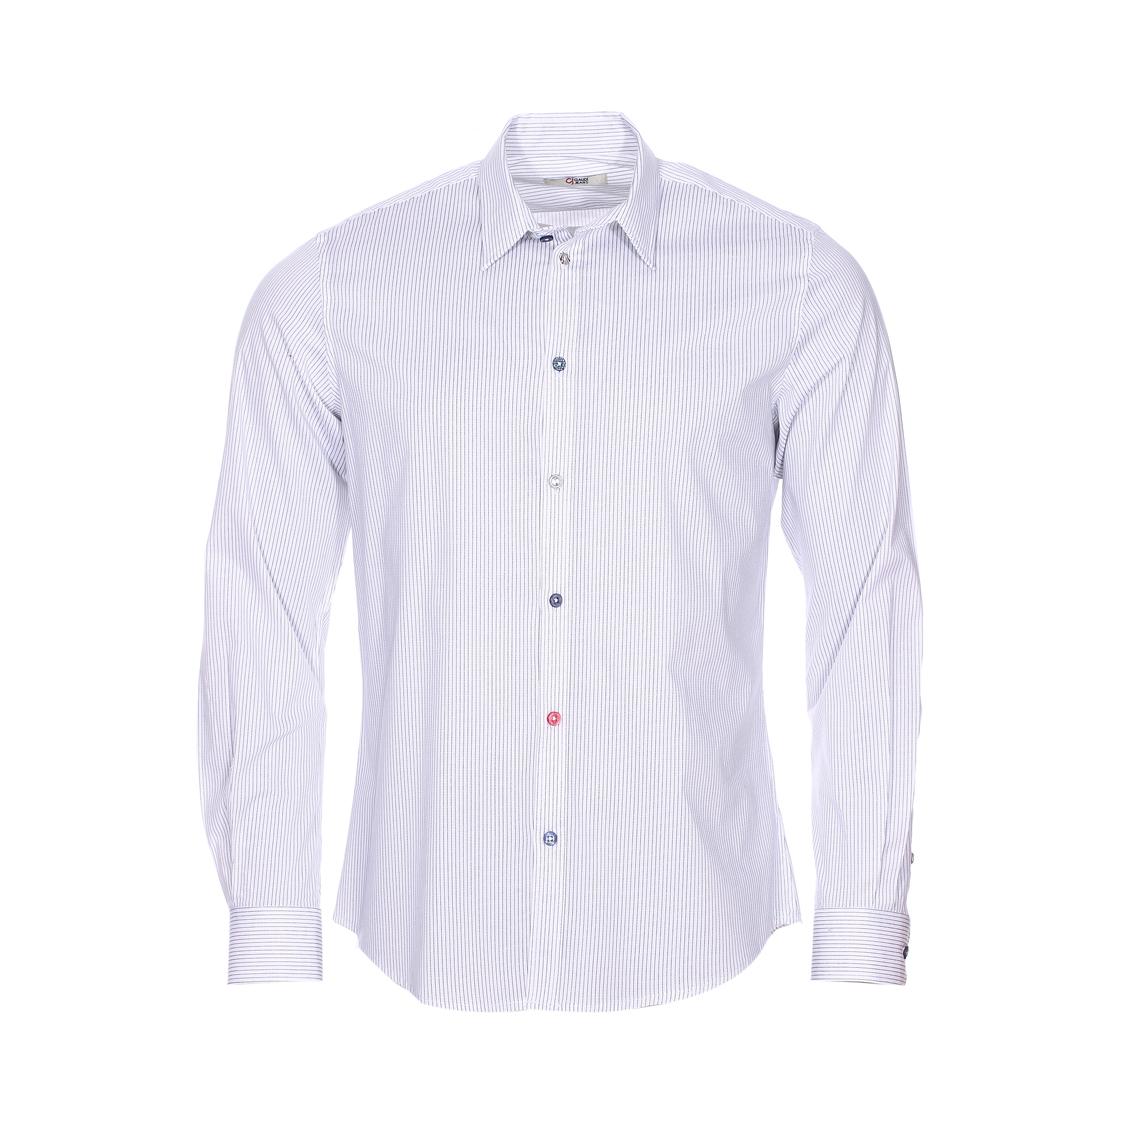 Chemise cintrée Gaudi en coton stretch blanc à rayures bleu marine